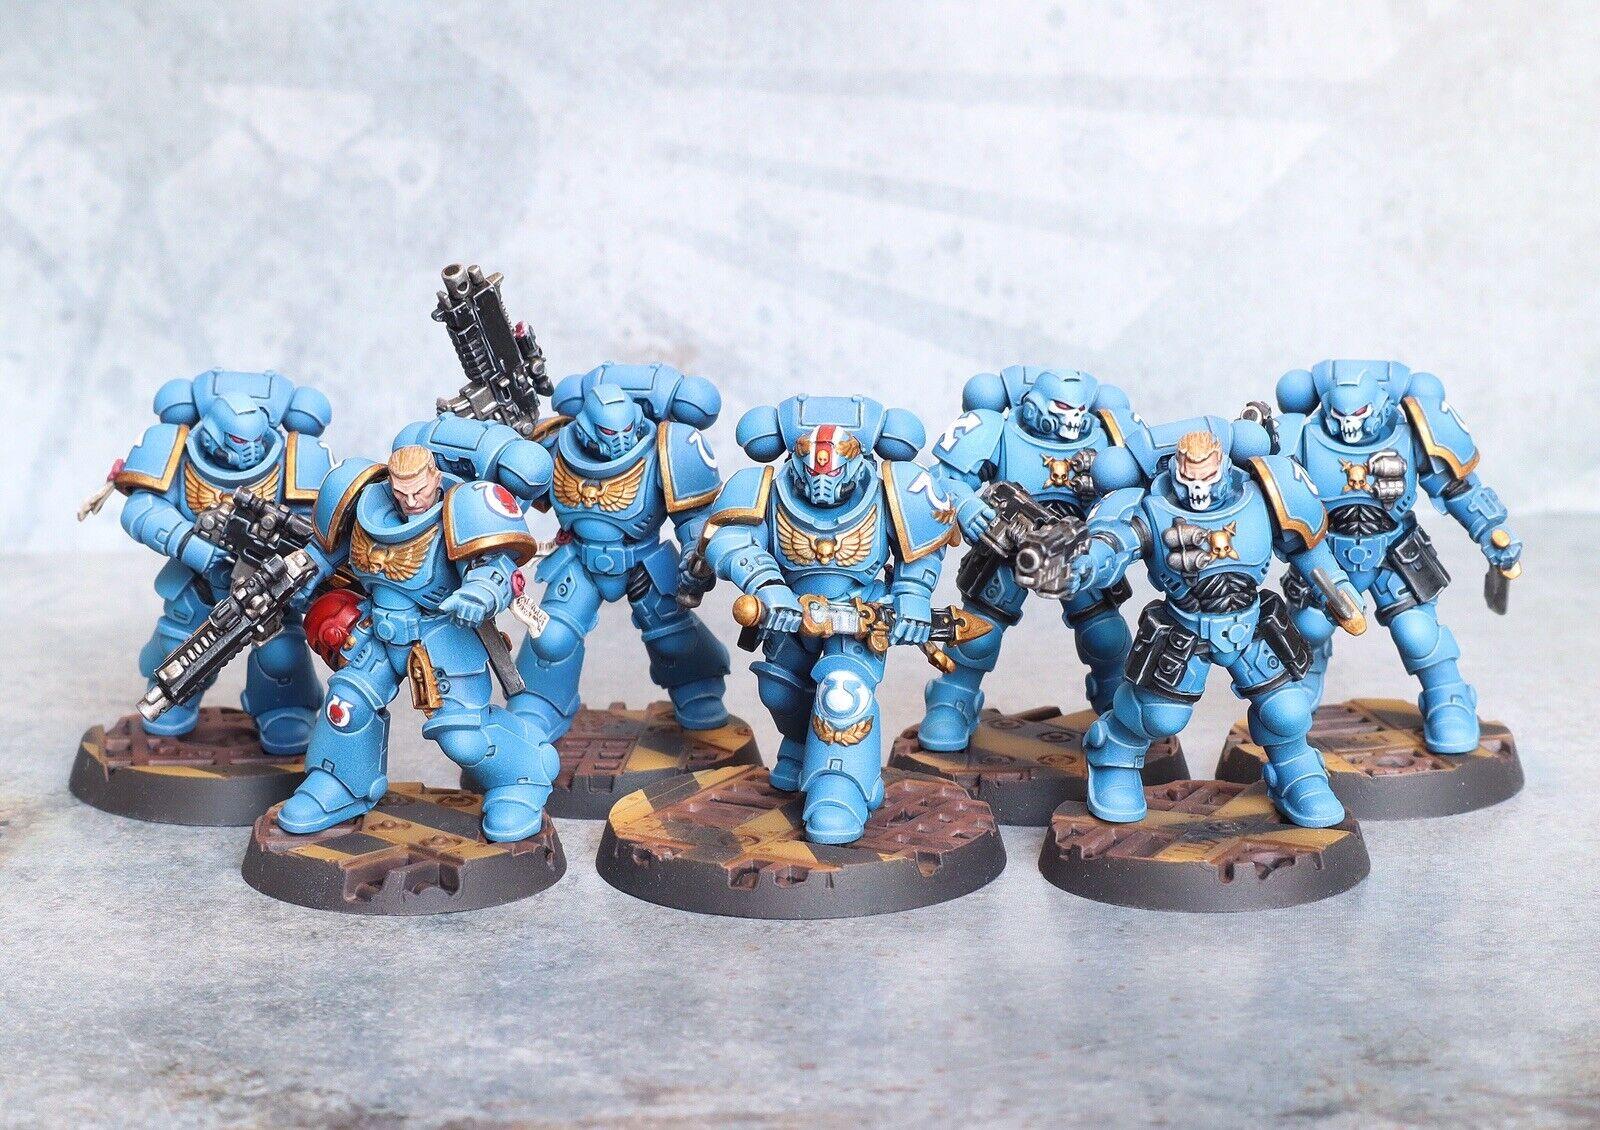 Primaris Intercessors Reivers Space Marines Kill Team -Pro Painted, Ultramarine